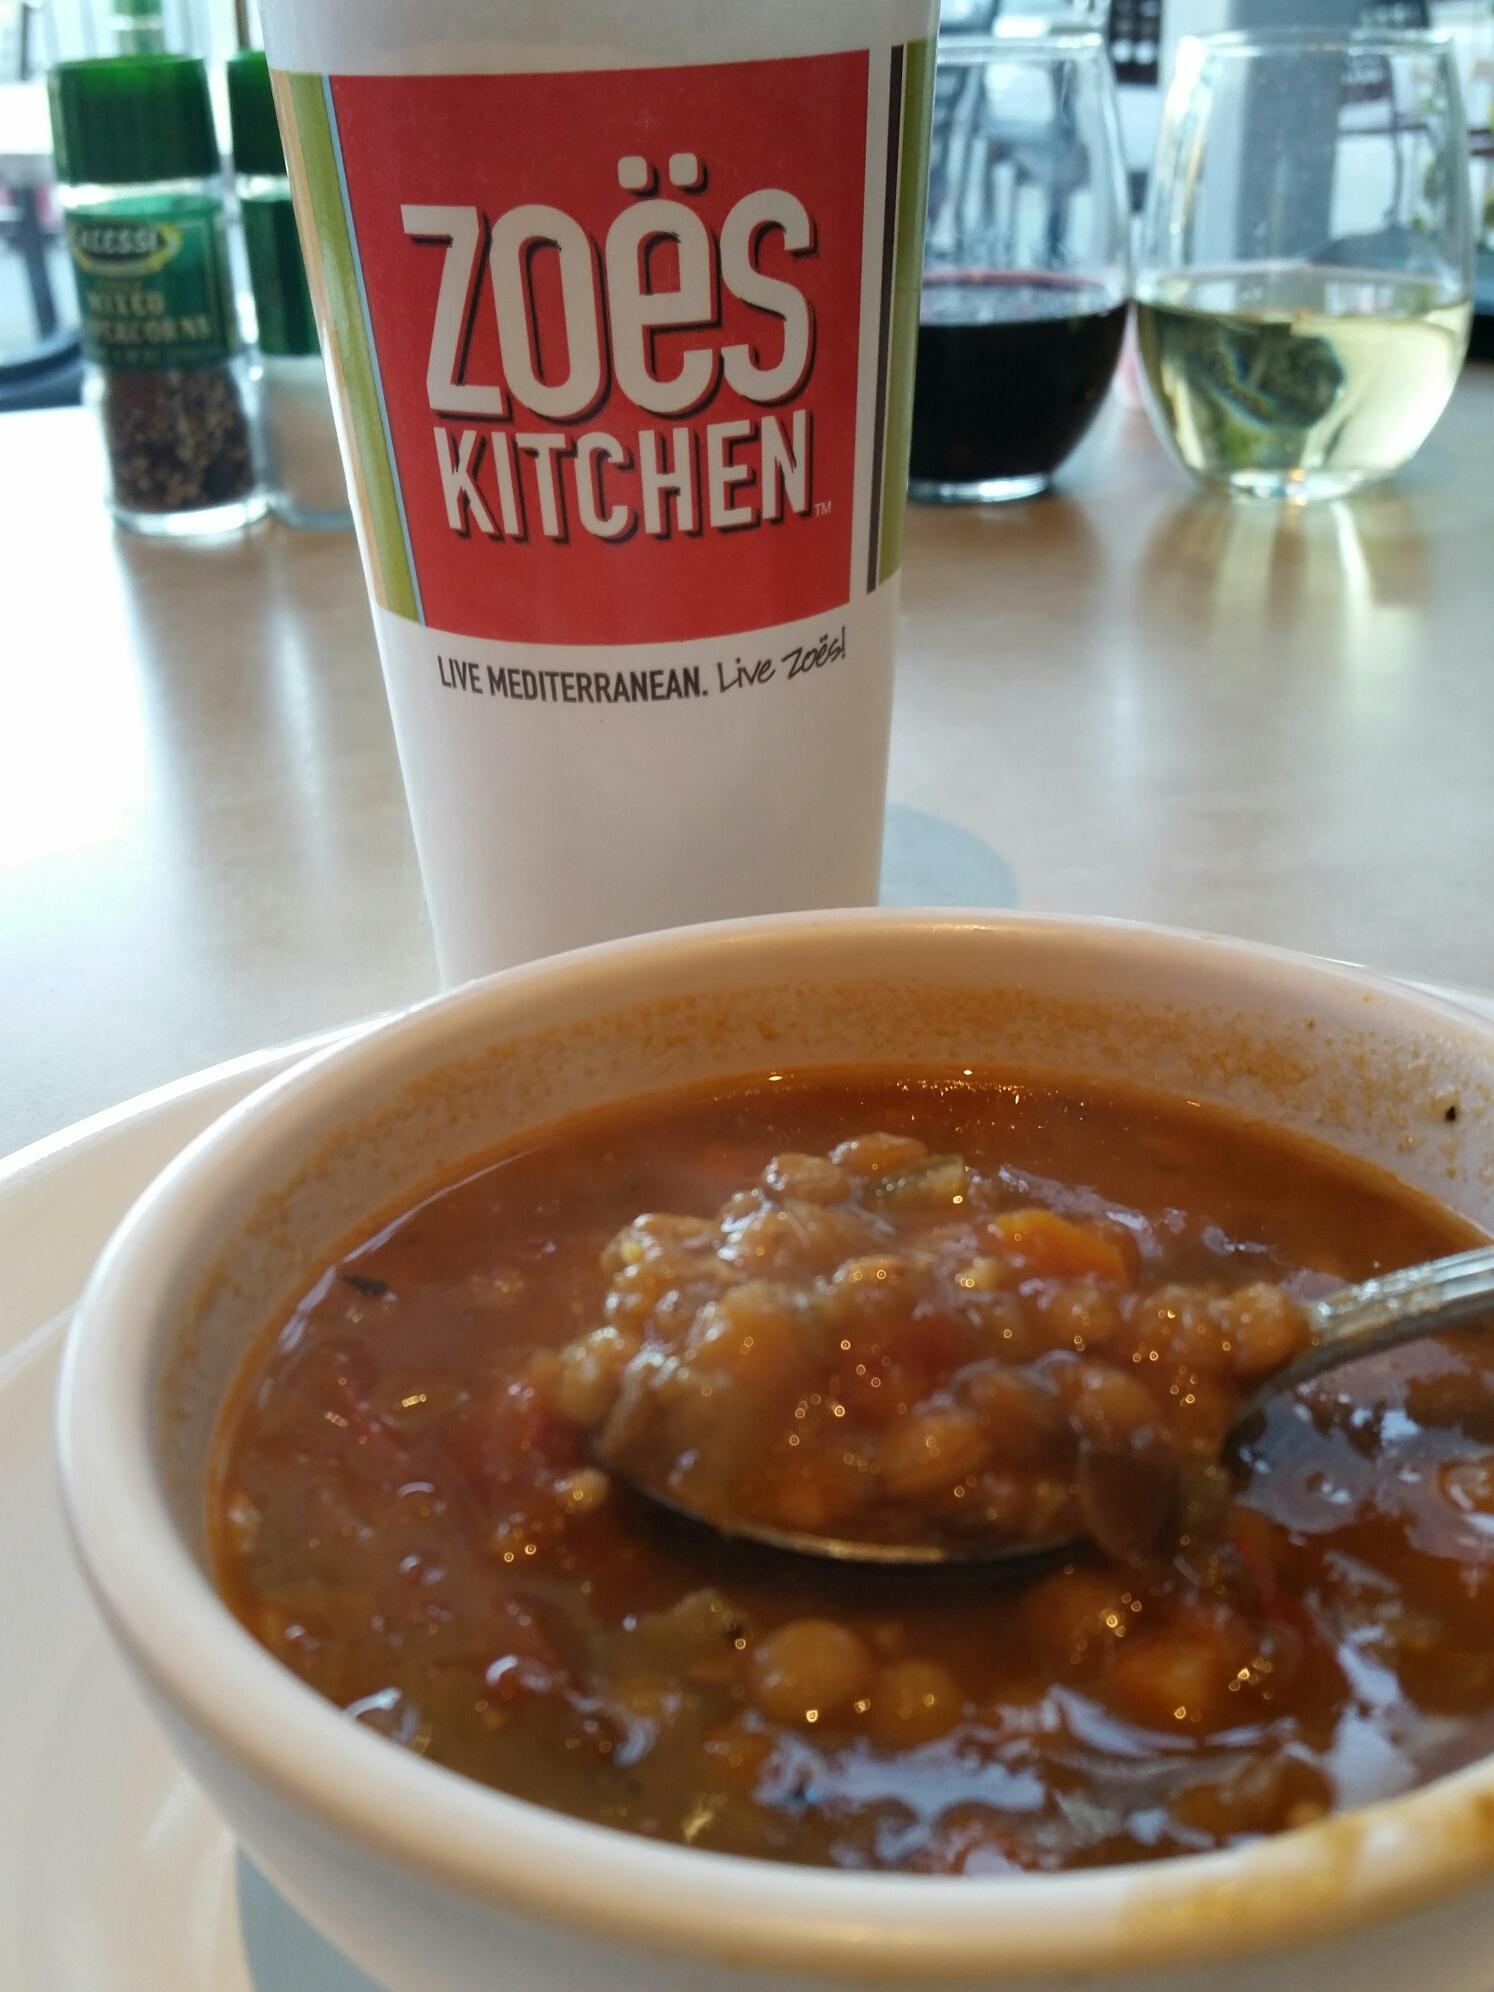 Zoes Kitchen Sign Zoes Kitchen  Sobesavvy